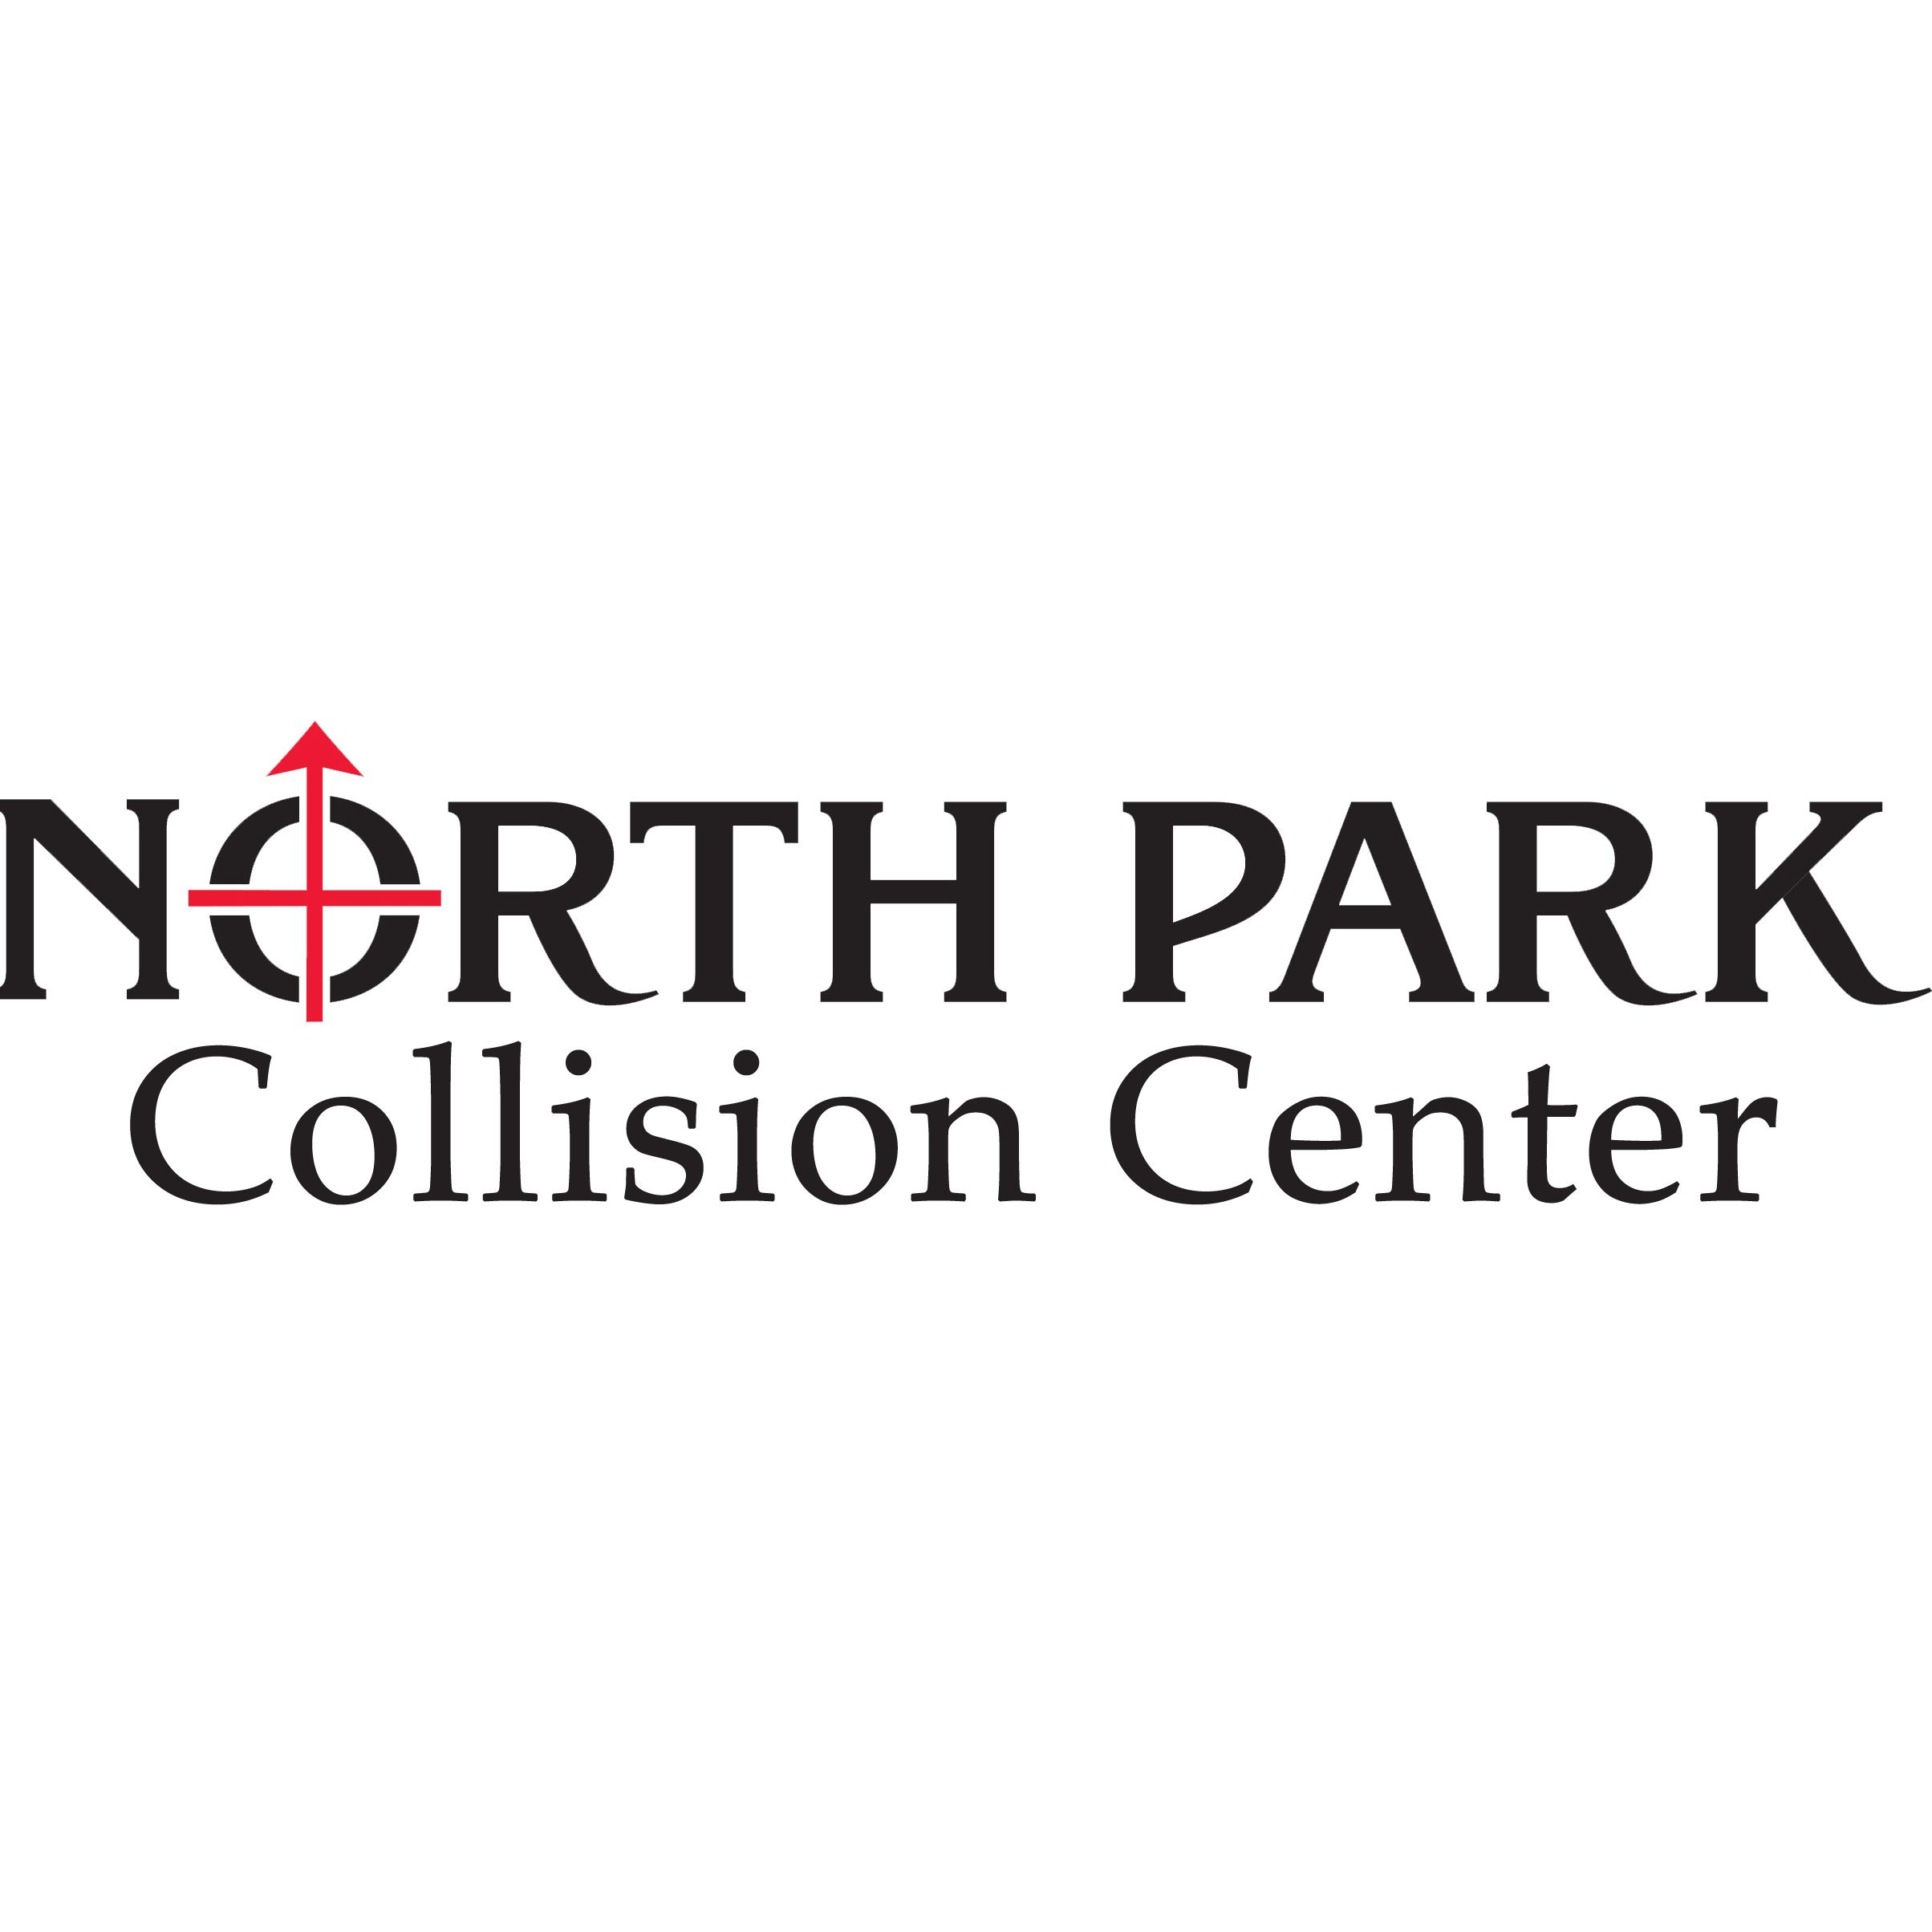 North Park Collision Center